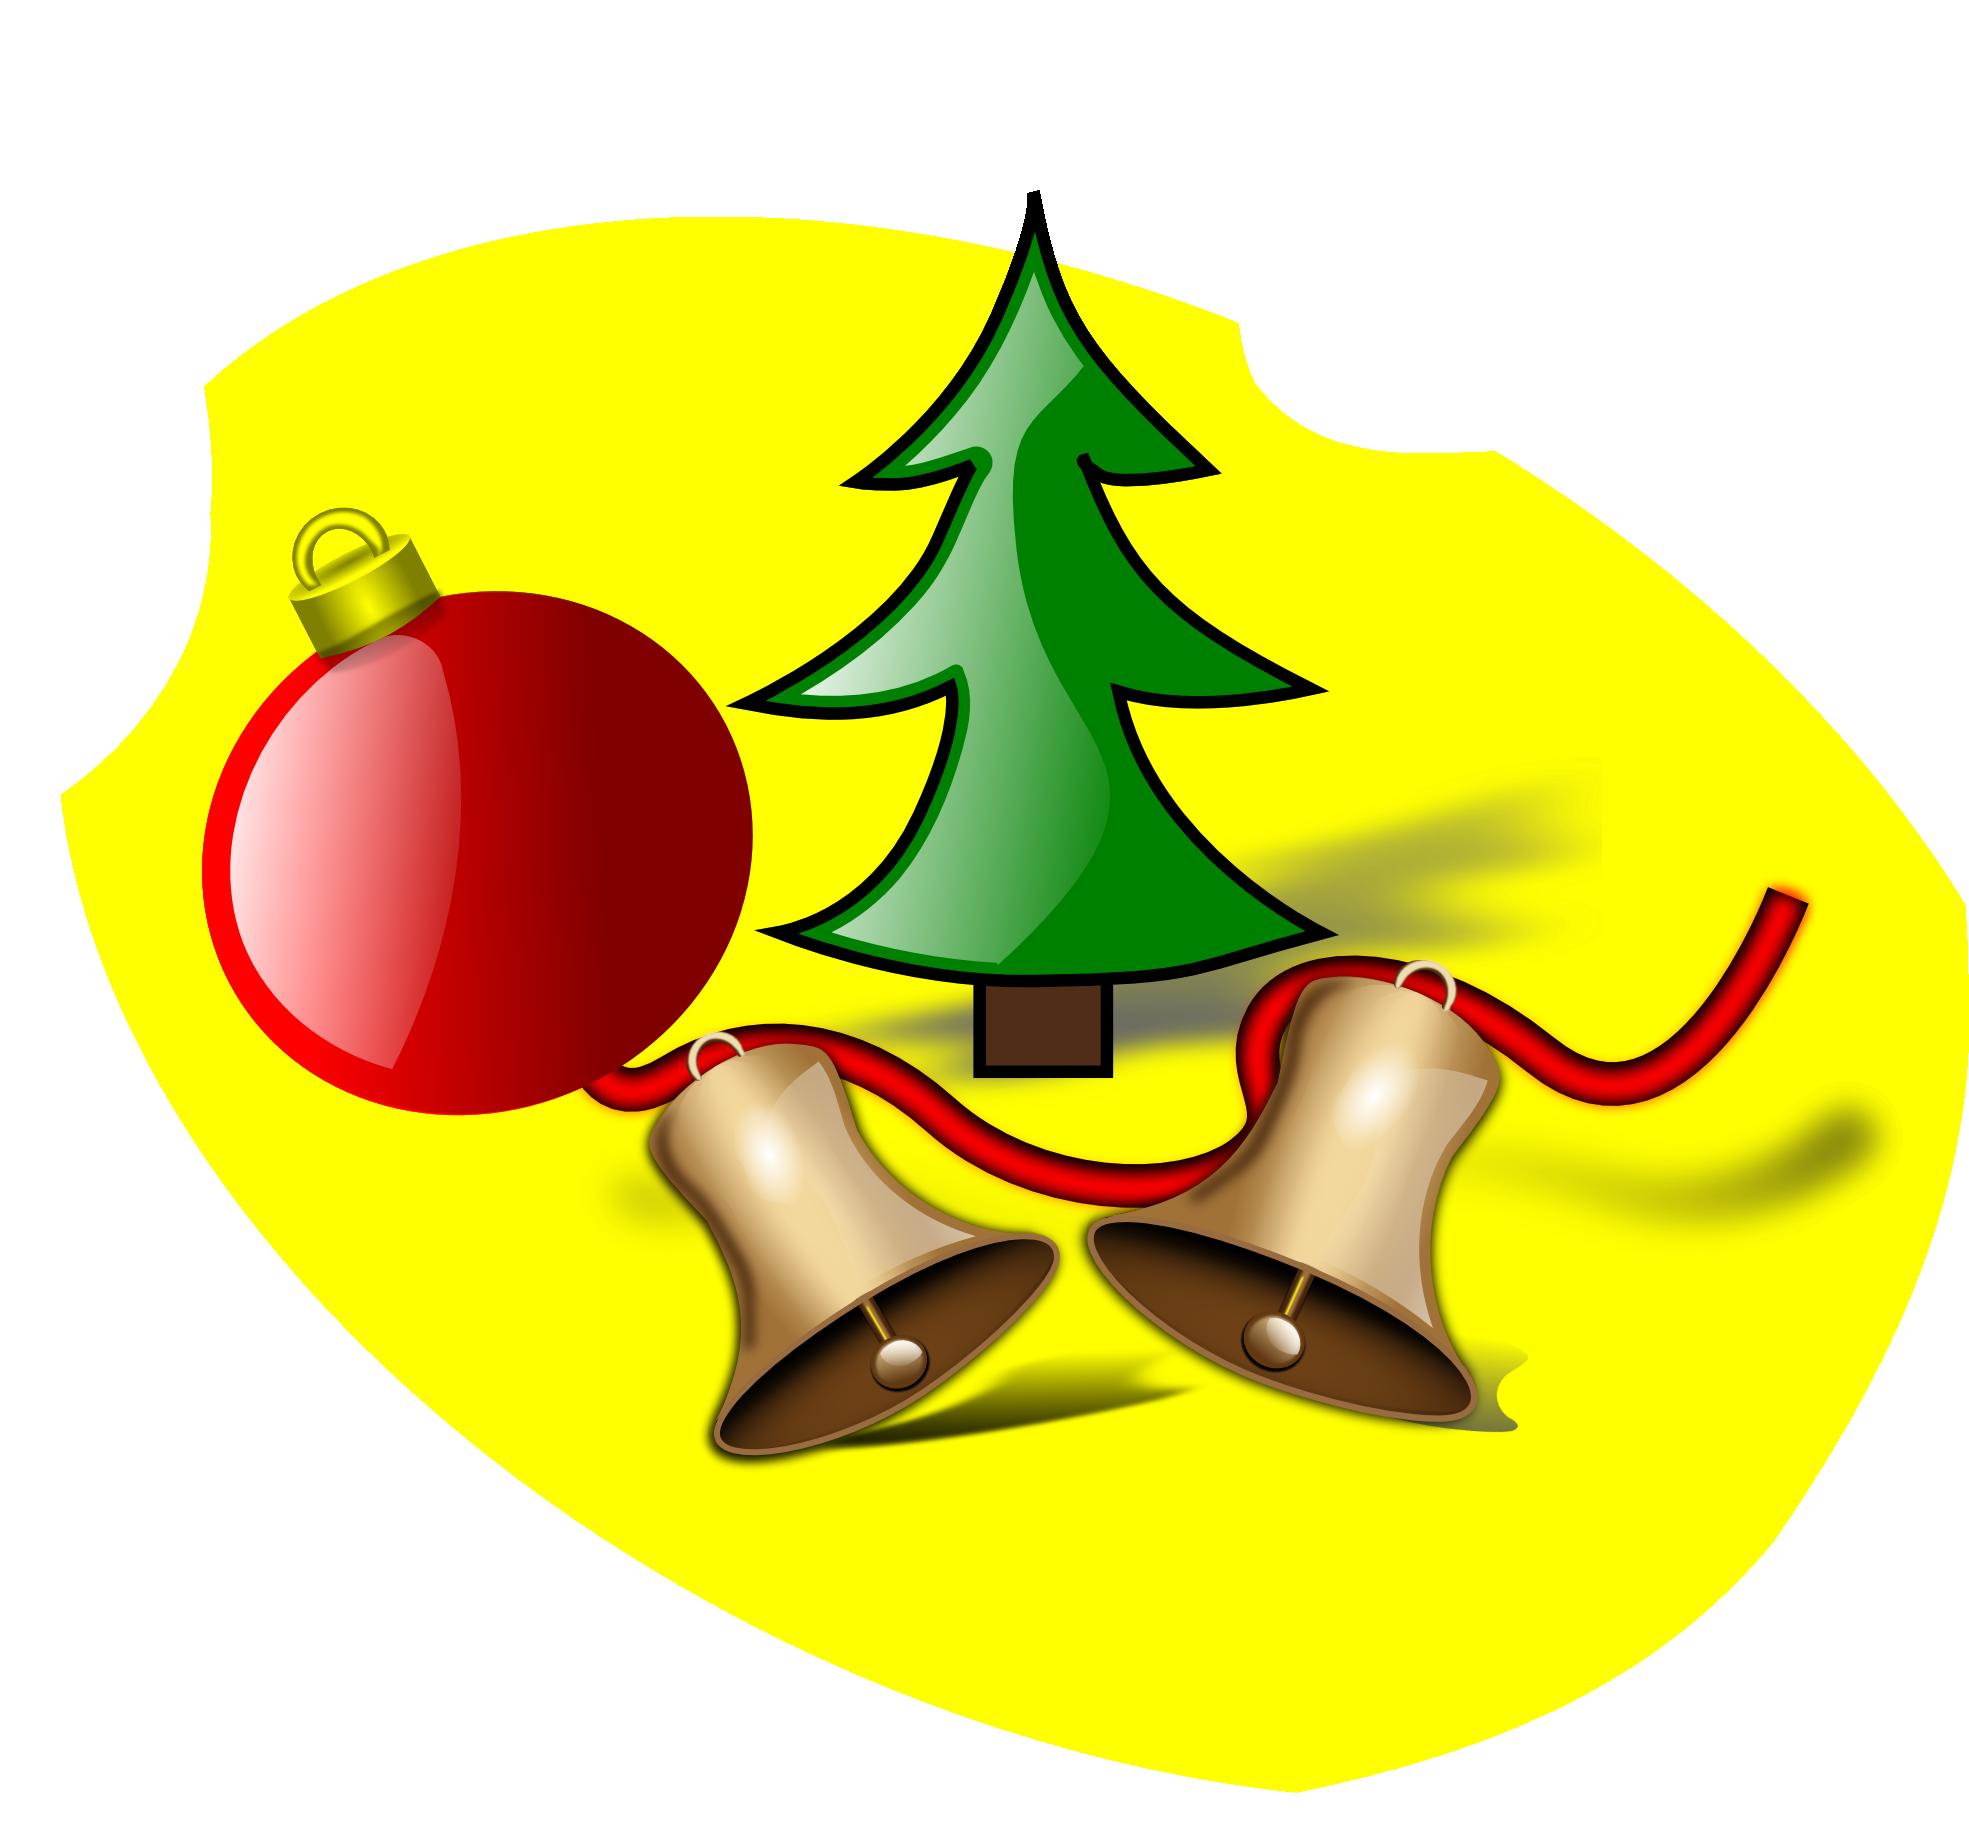 Xmas Stuff For Christmas Jingle Bells Cl-Xmas Stuff For Christmas Jingle Bells Clip Art-18